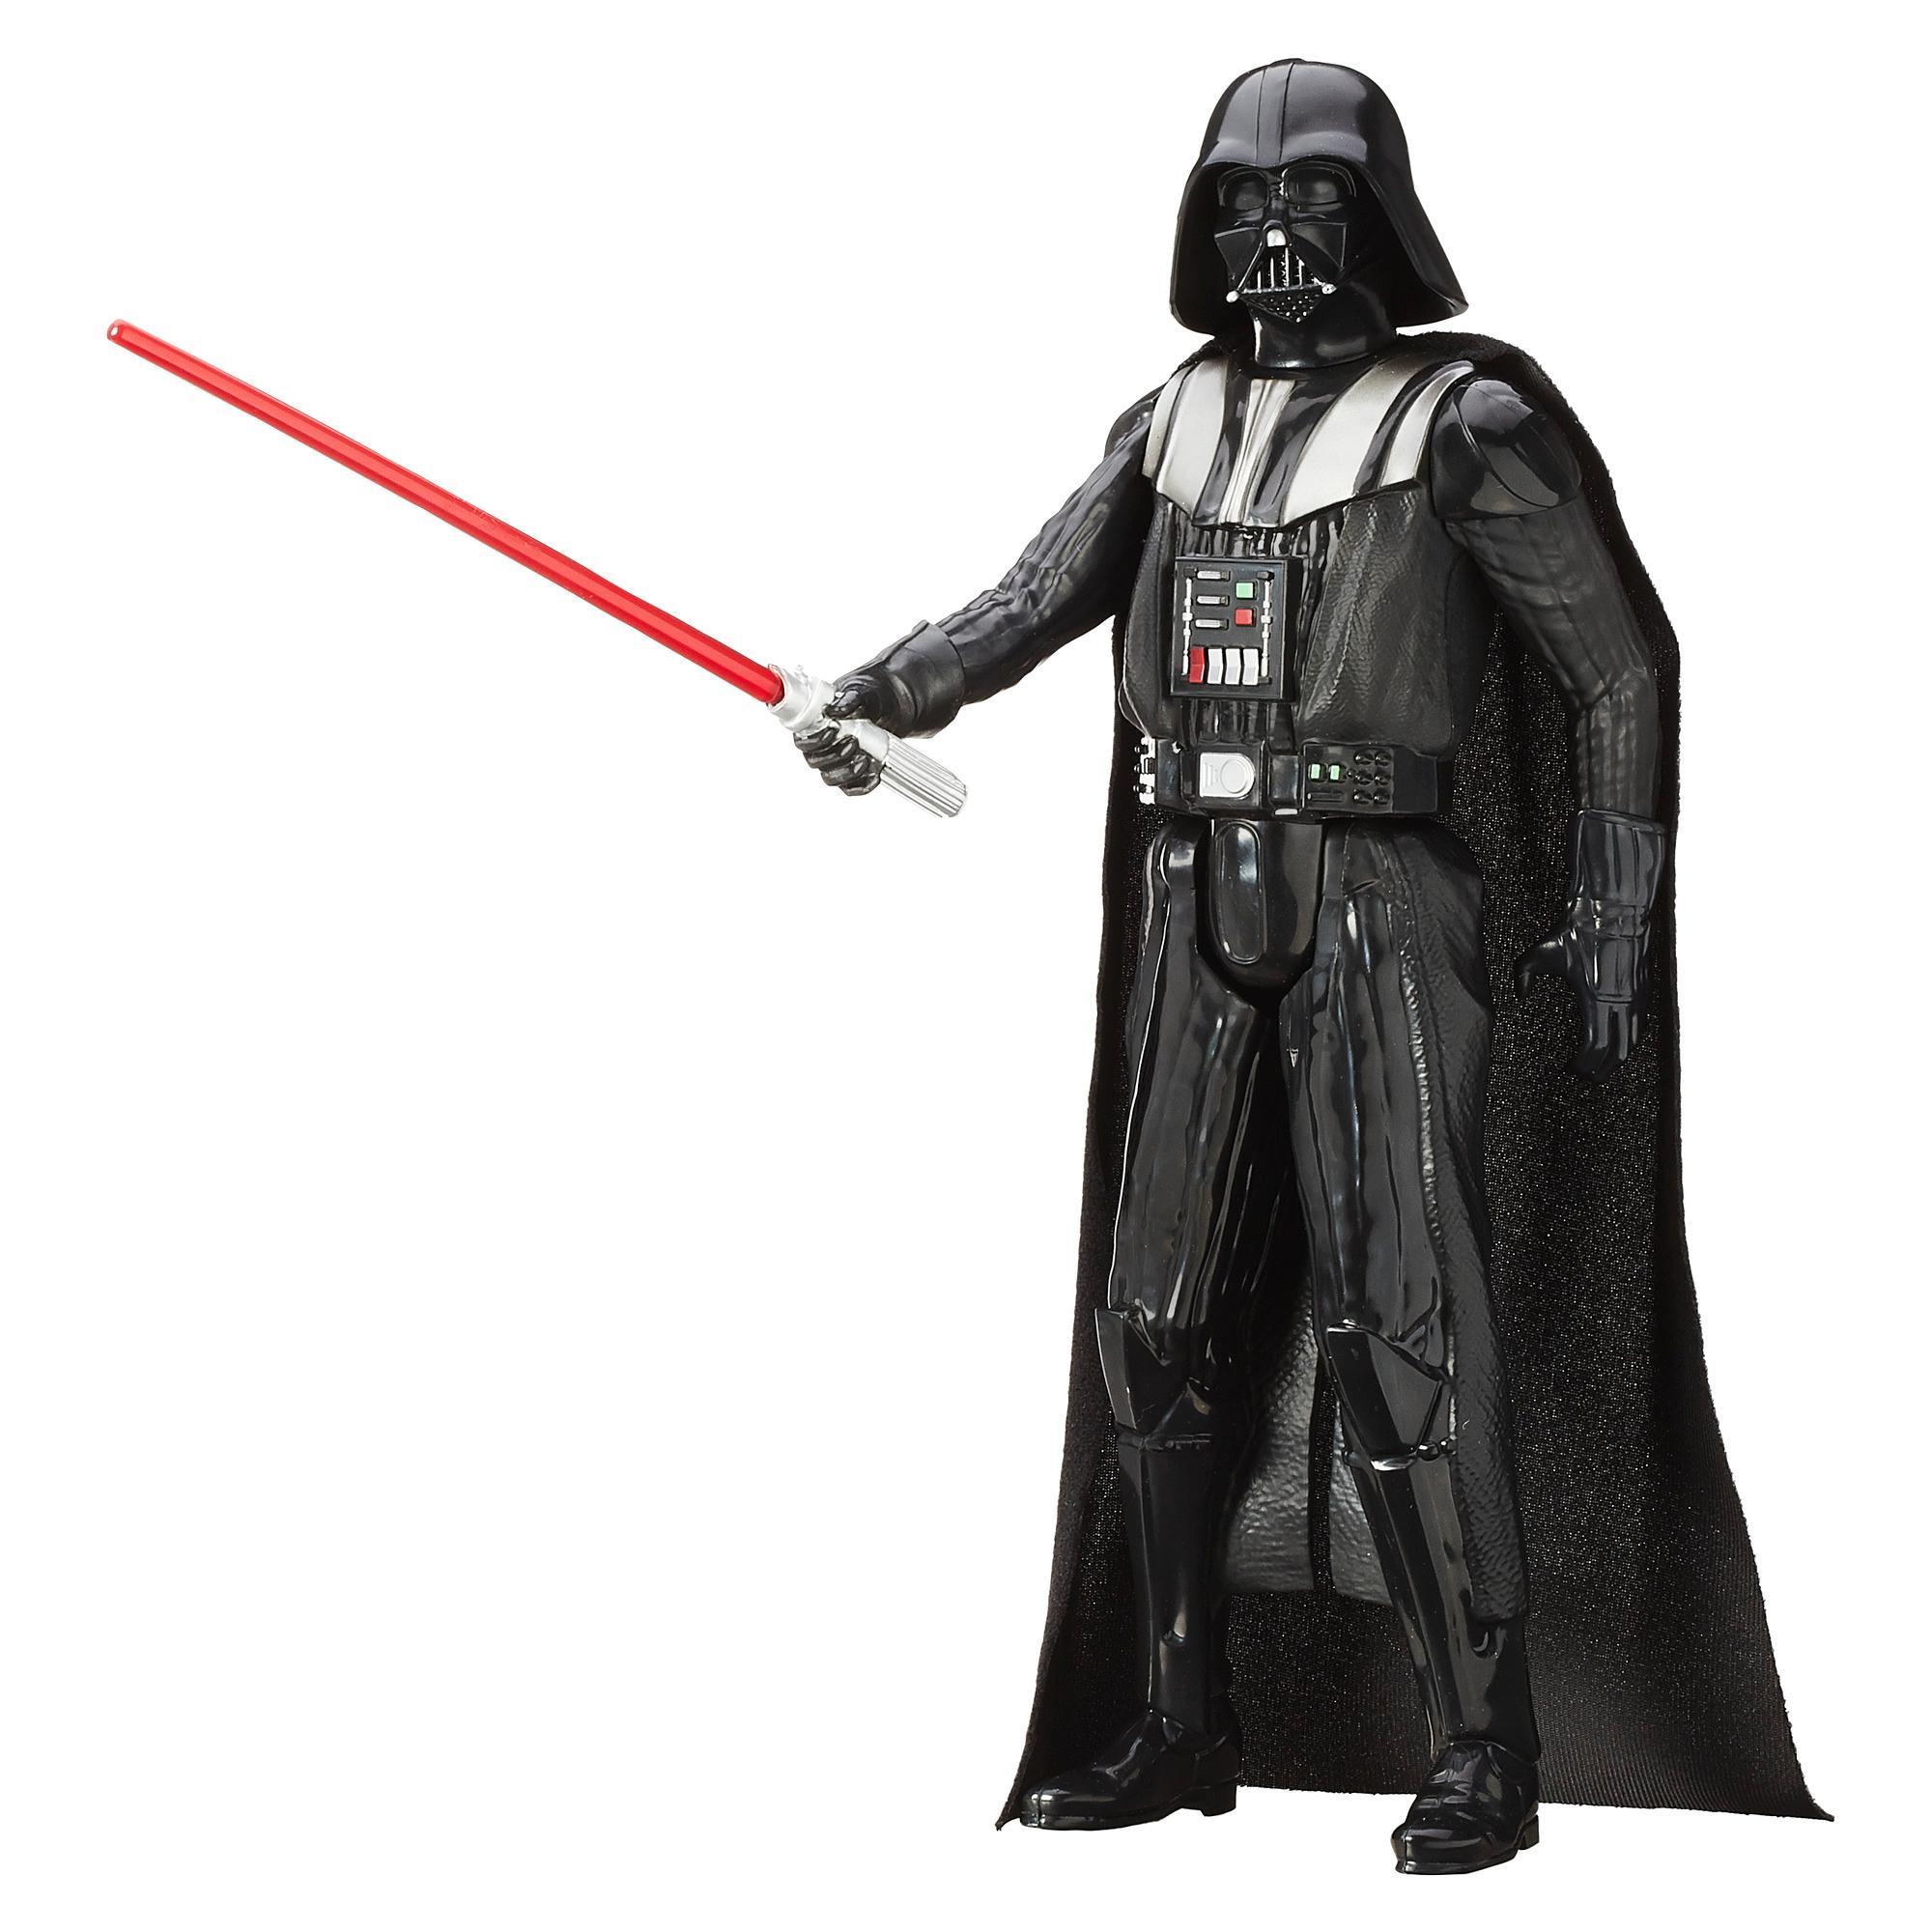 Star Wars Revenge of the Sith Darth Vader de 30 cm (12 in)